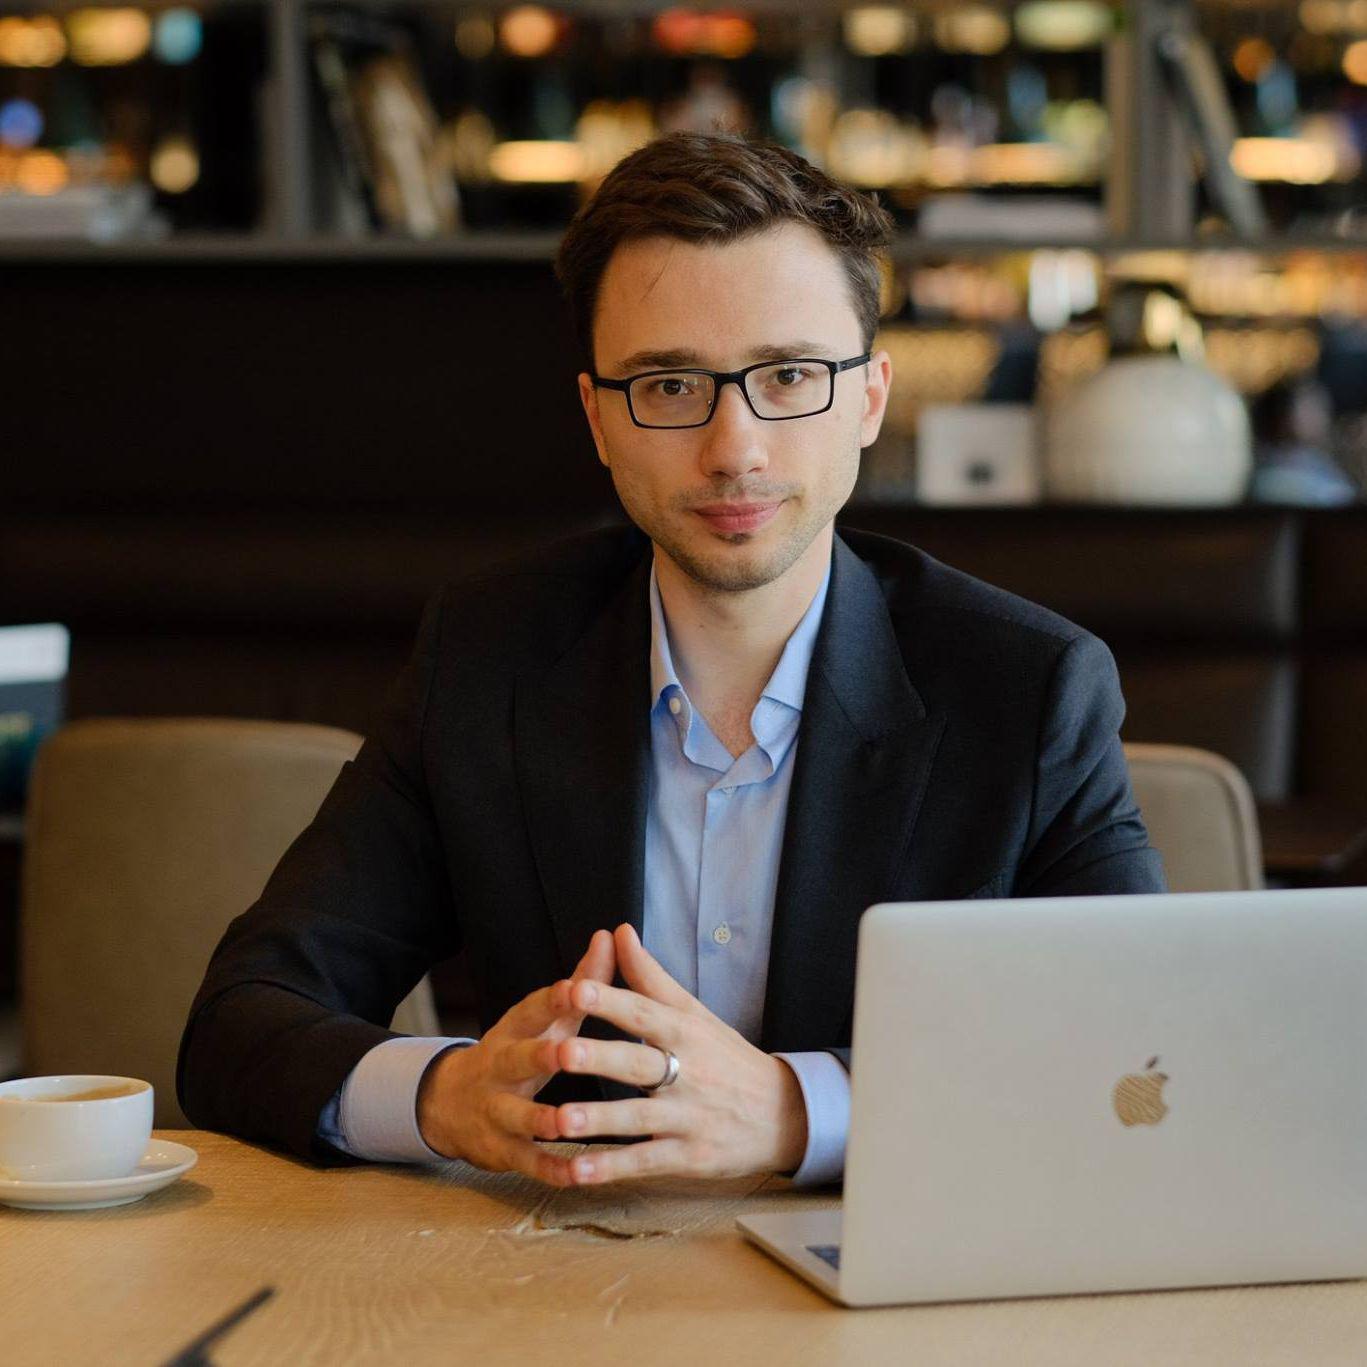 web developers freelance